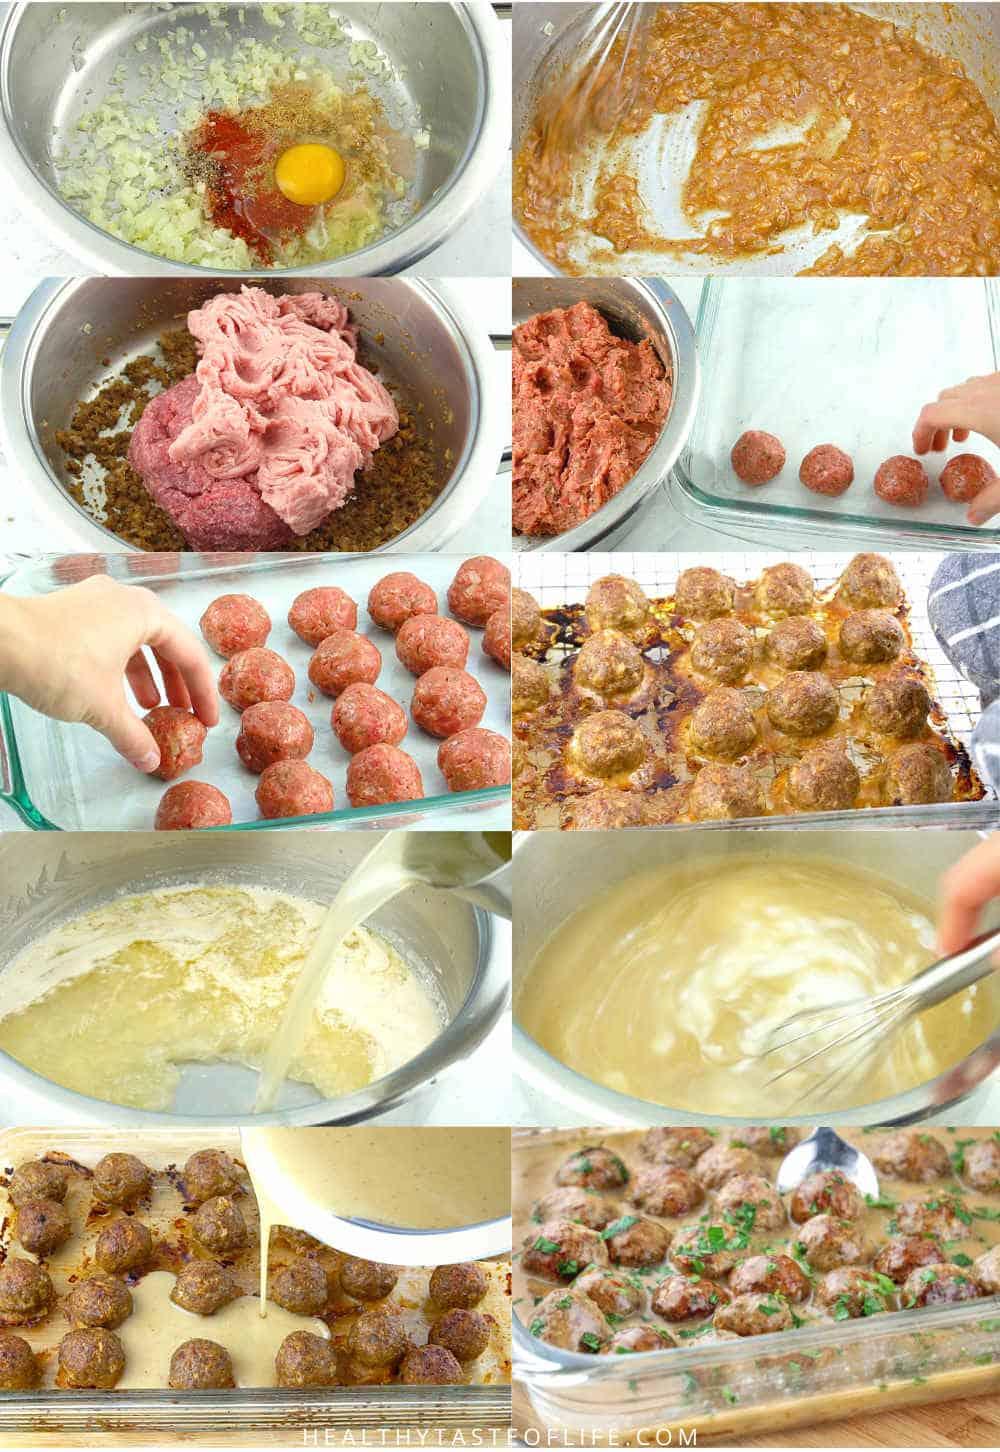 How To Make Gluten Free Swedish Meatballs + Dairy Free Sauce